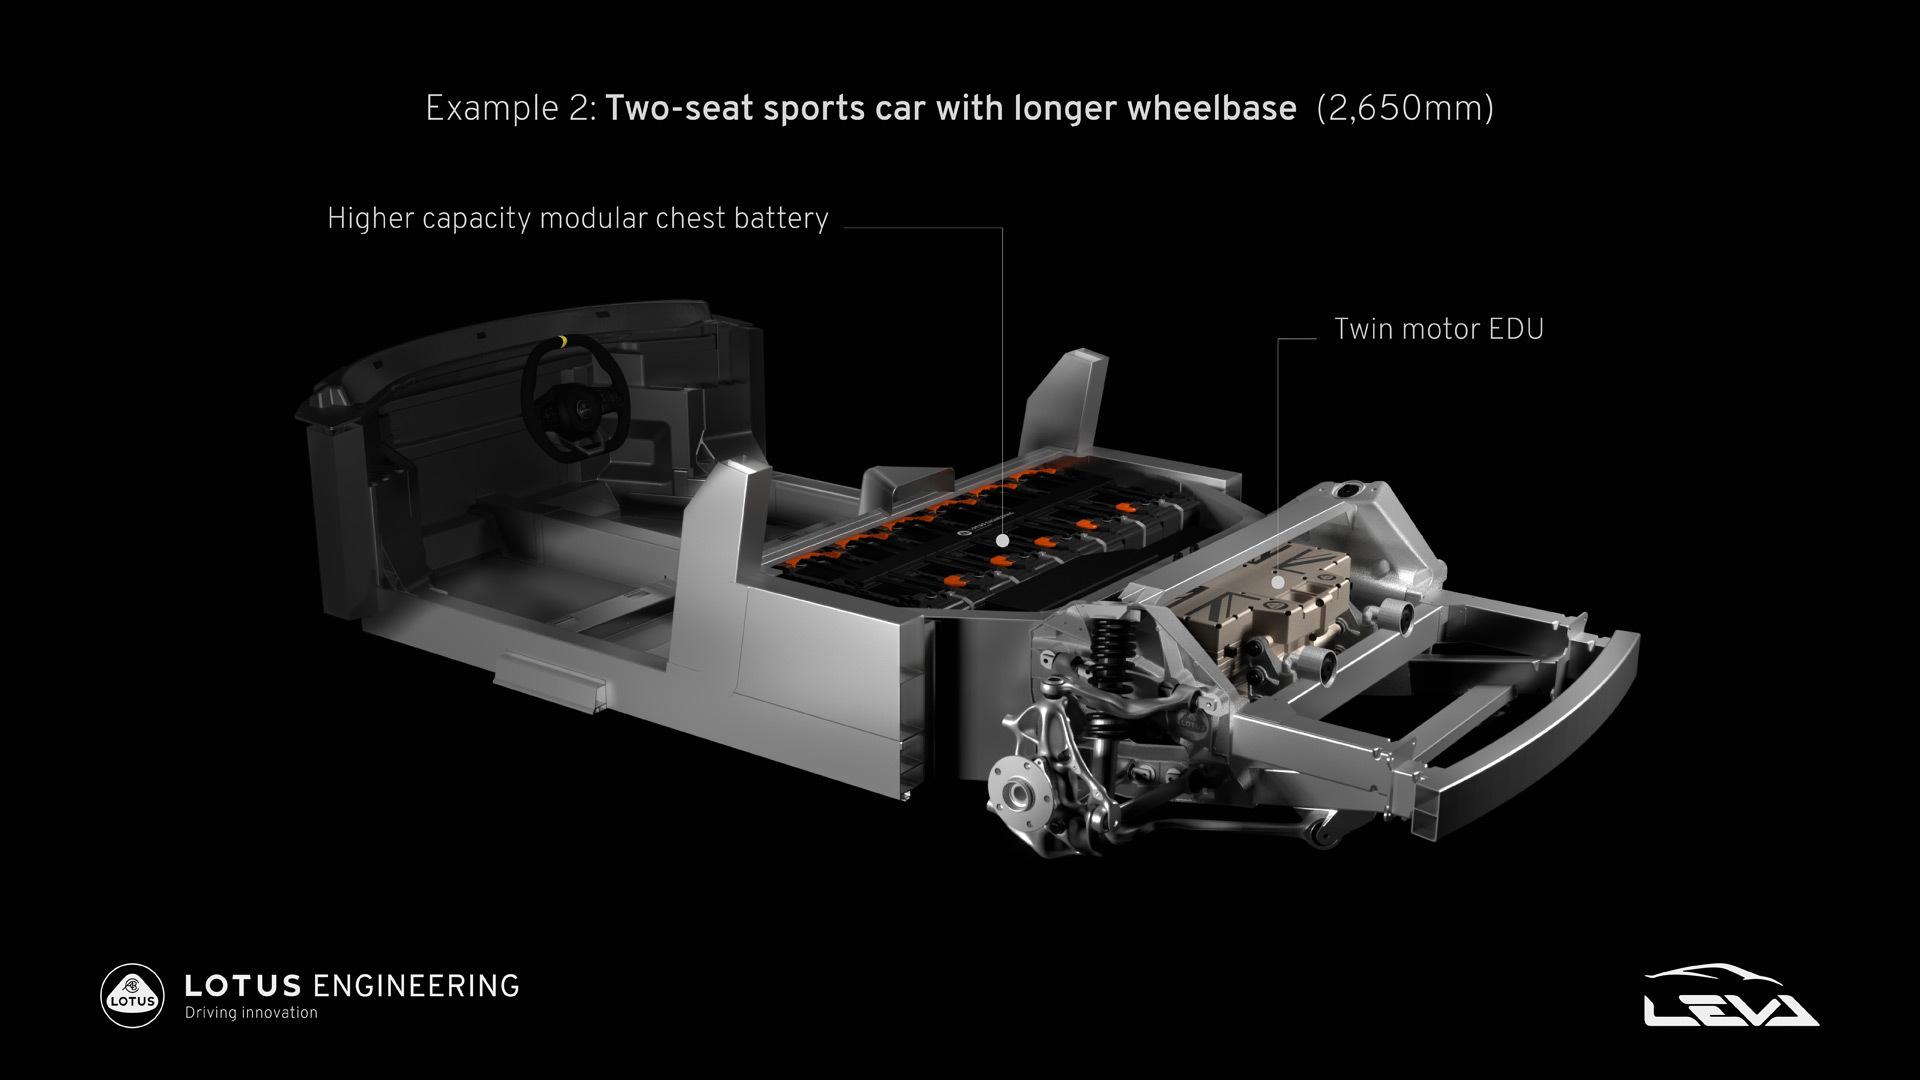 Lotus E-Sports platform (Project LEVA) for long-wheelbase electric sports cars